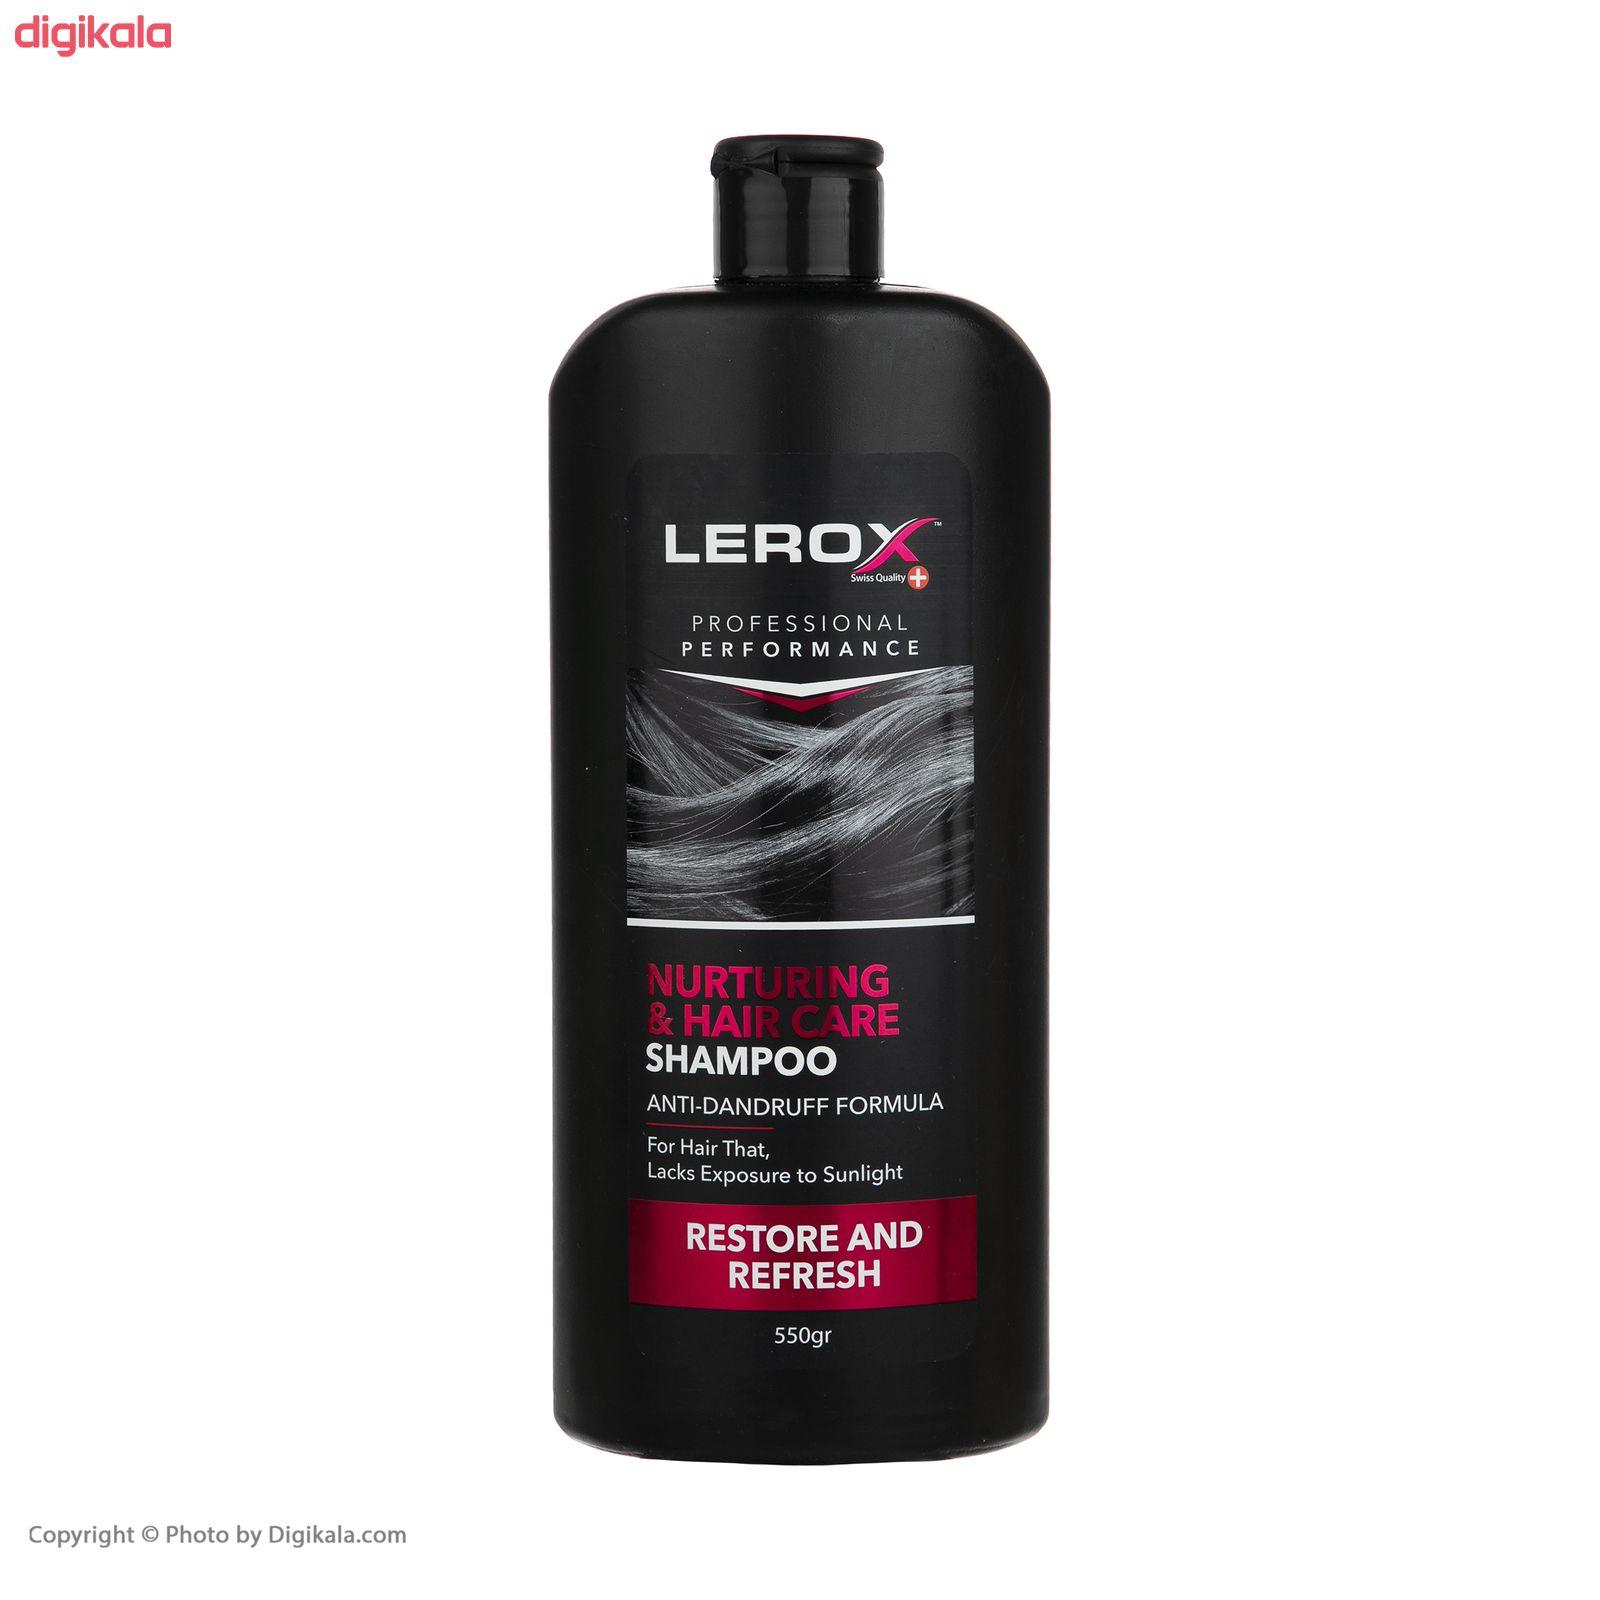 شامپو مو لروکس مدل Nurturing & Hair Care وزن 550 گرم main 1 4